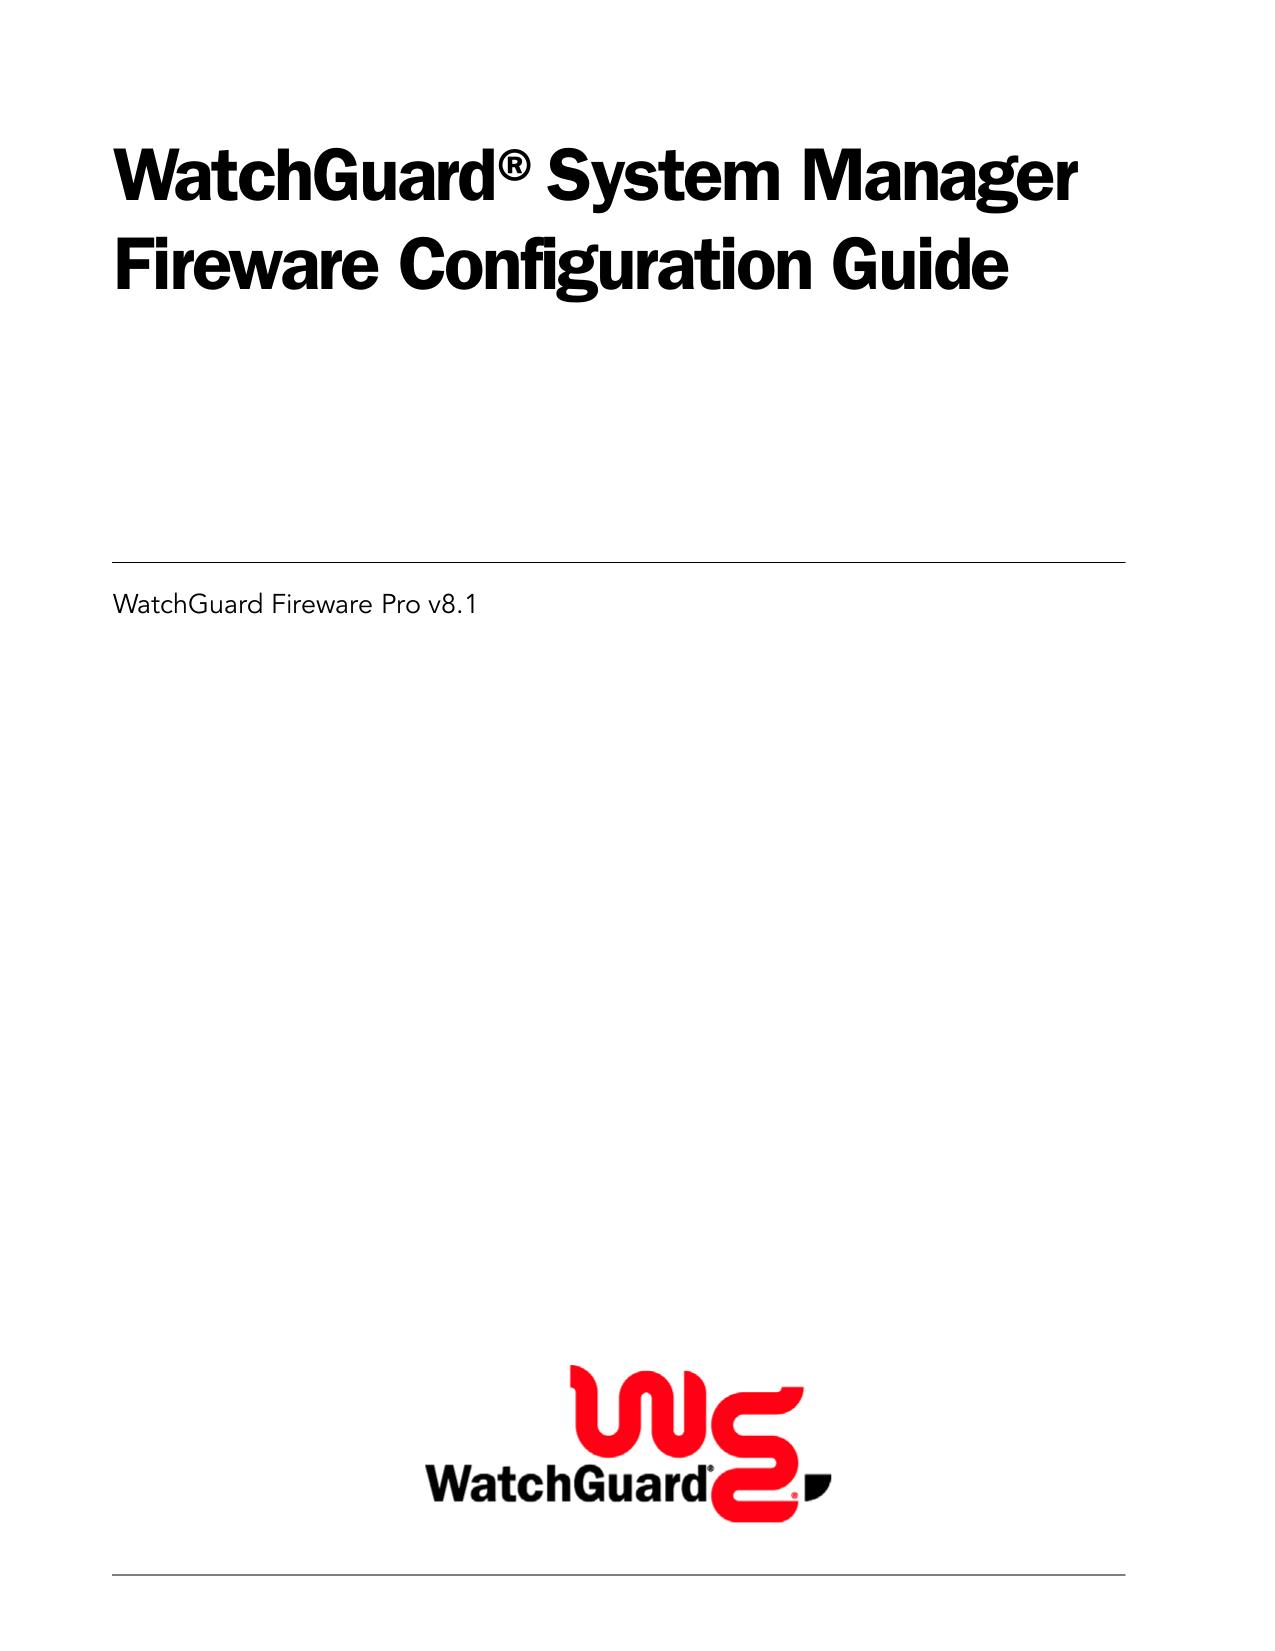 PDF manual for Watchguard Router Firebox X550E